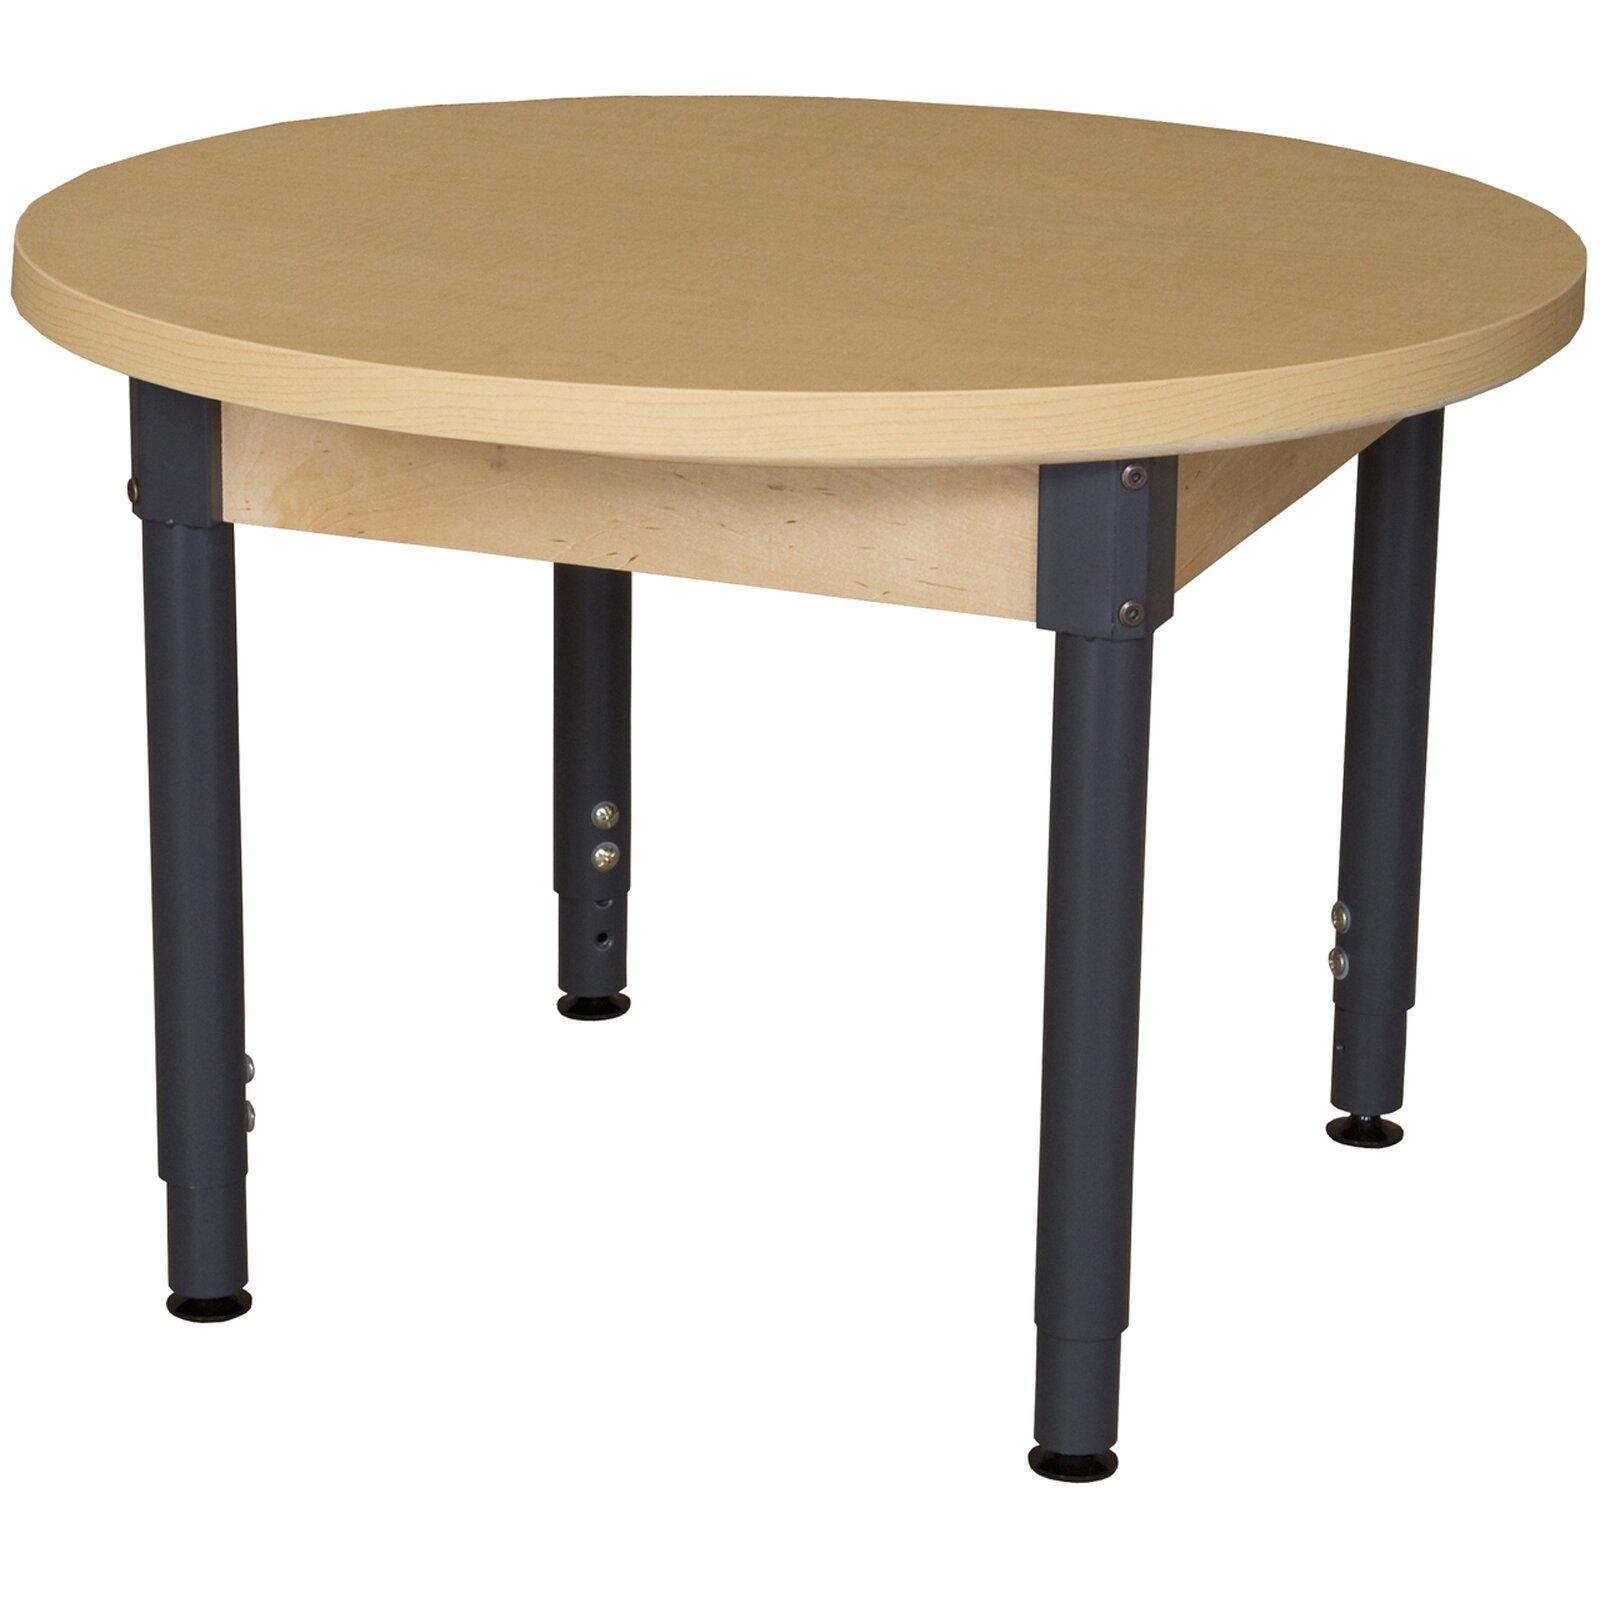 Round High Pressure Laminate Table Adjustable Legs